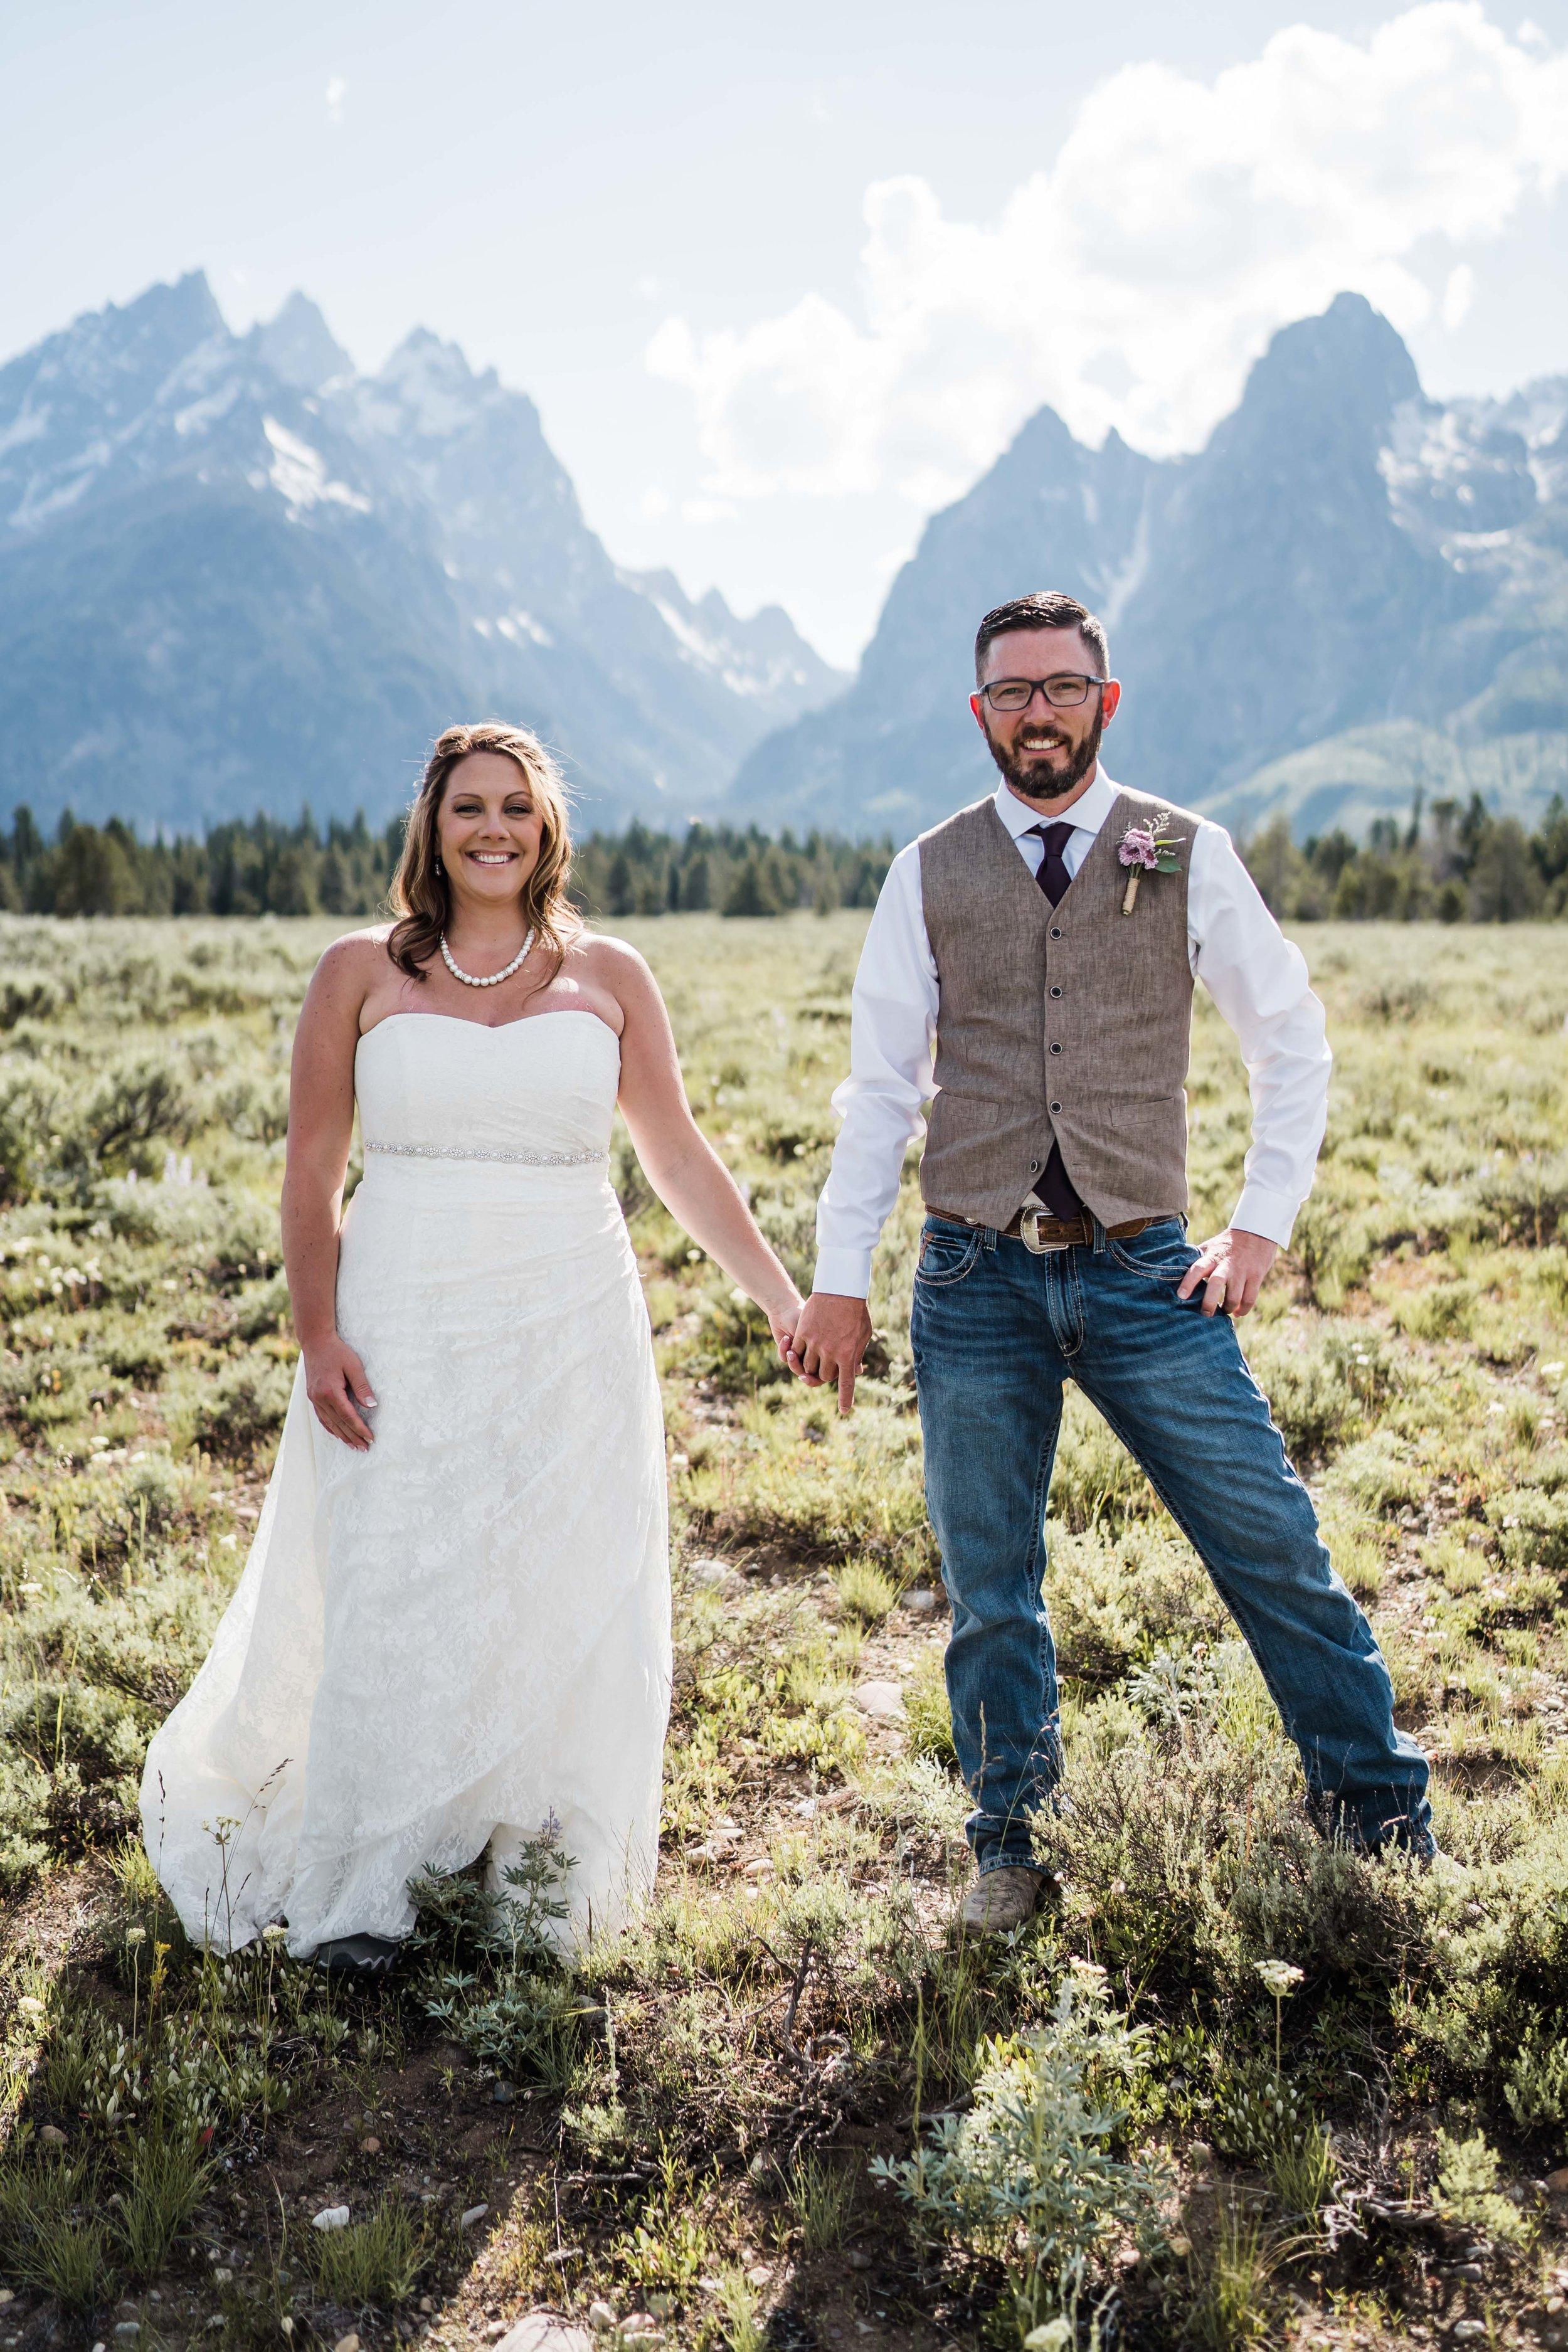 jackson hole adventure wedding photography at schwabachers landing in GTNP -DSD01162.jpg